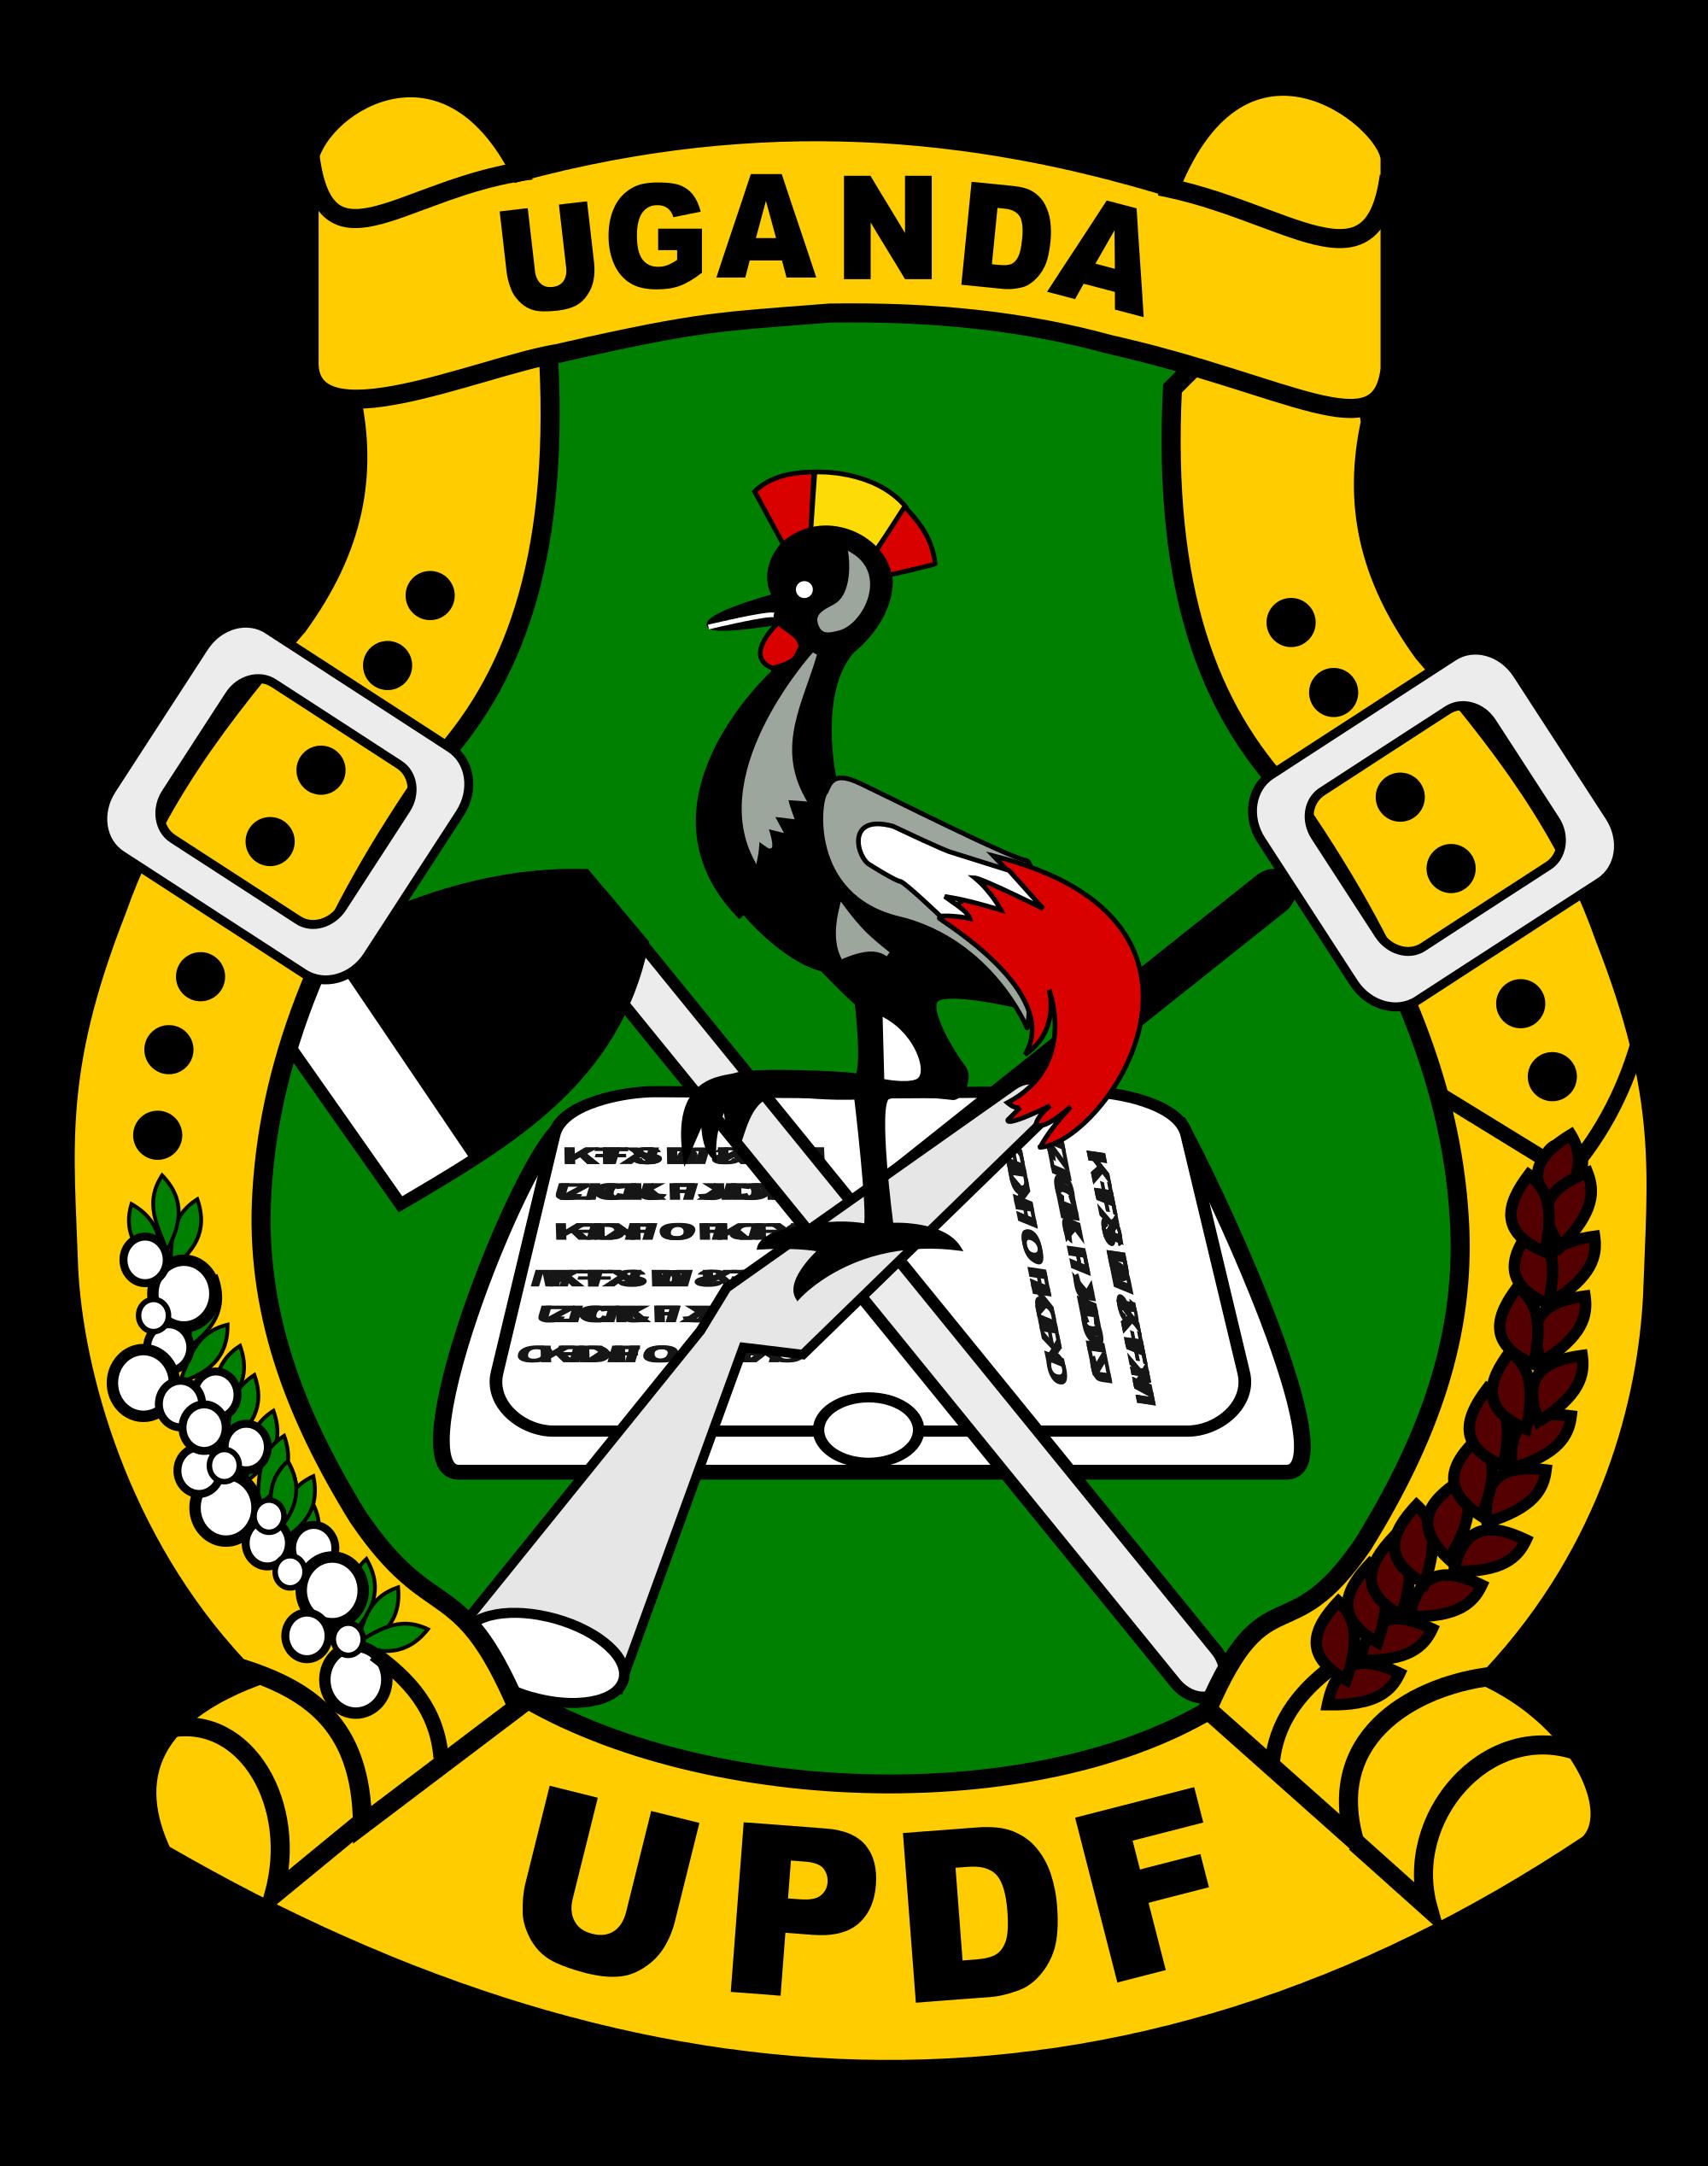 Movement clipart pe uniform. Uganda people s defense